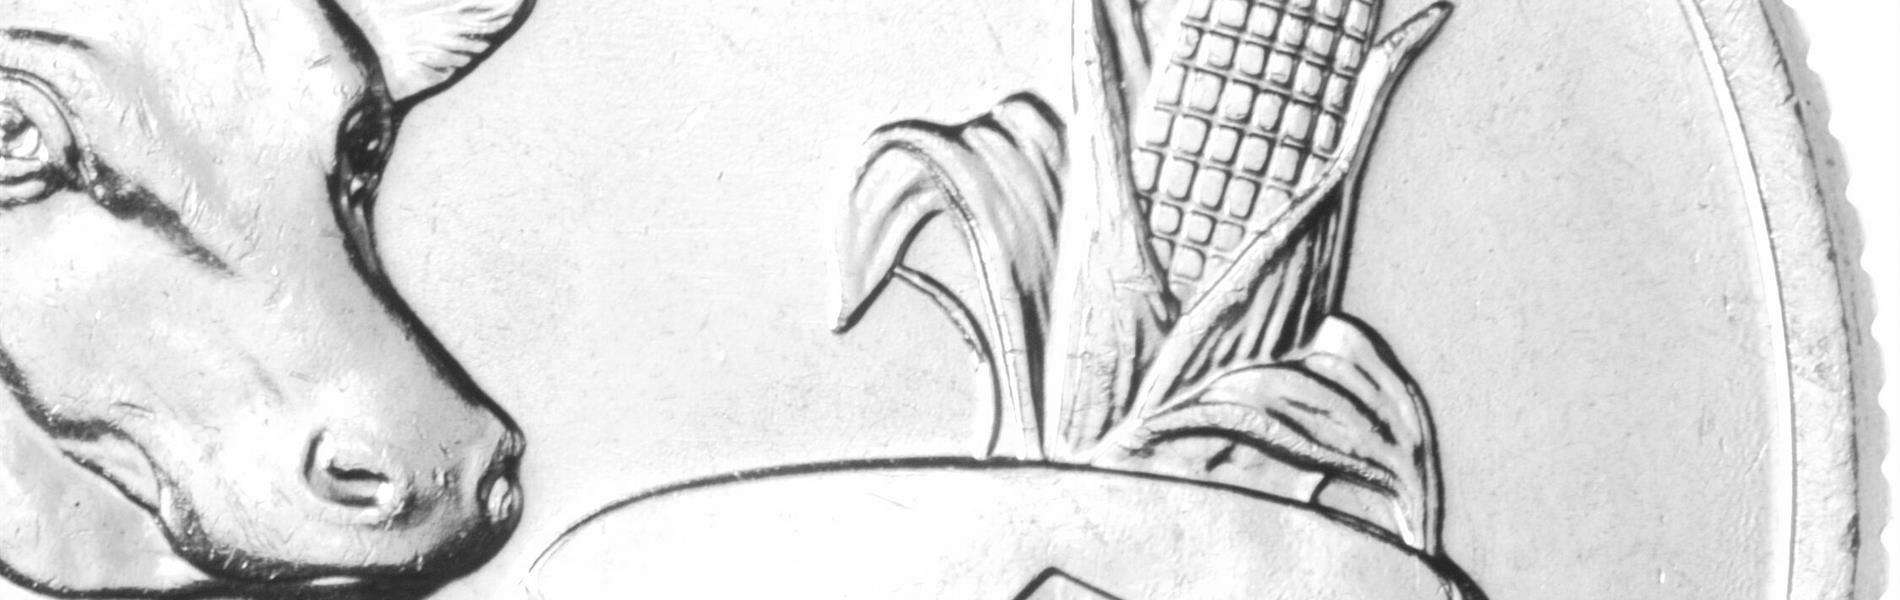 25c-wis-leaf-up-close-up